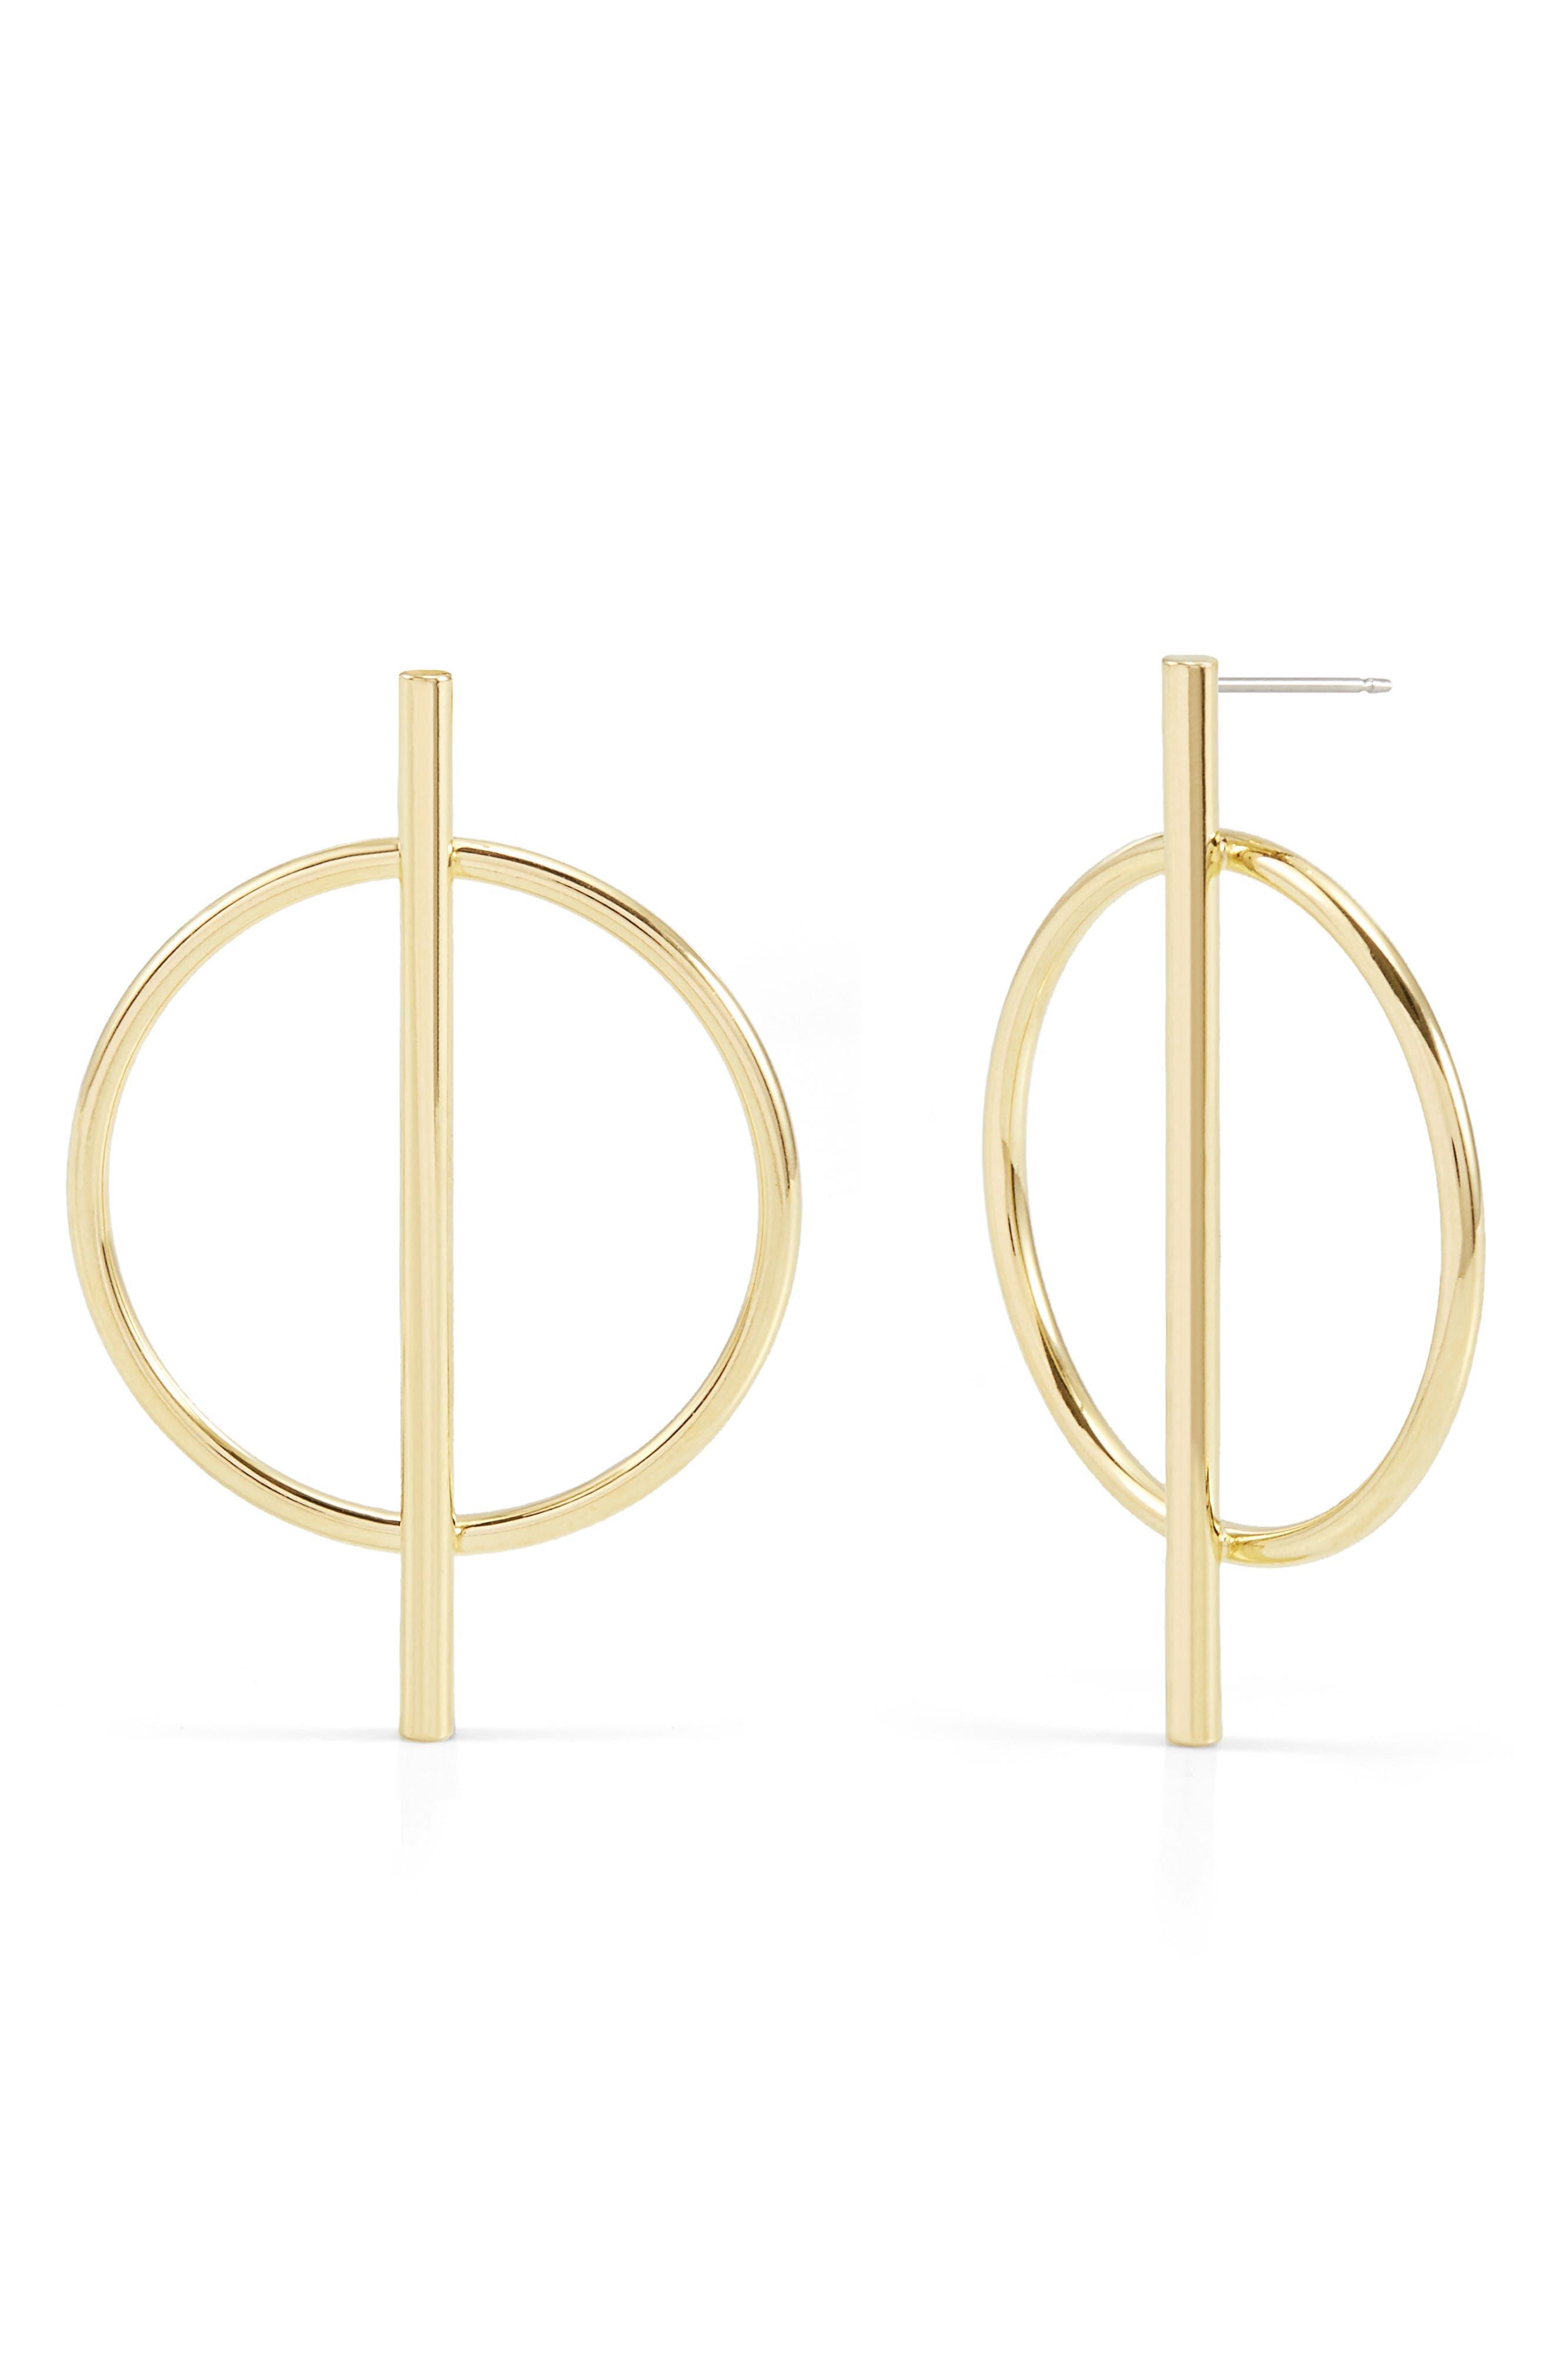 Piper Long Bar Hoop Earrings